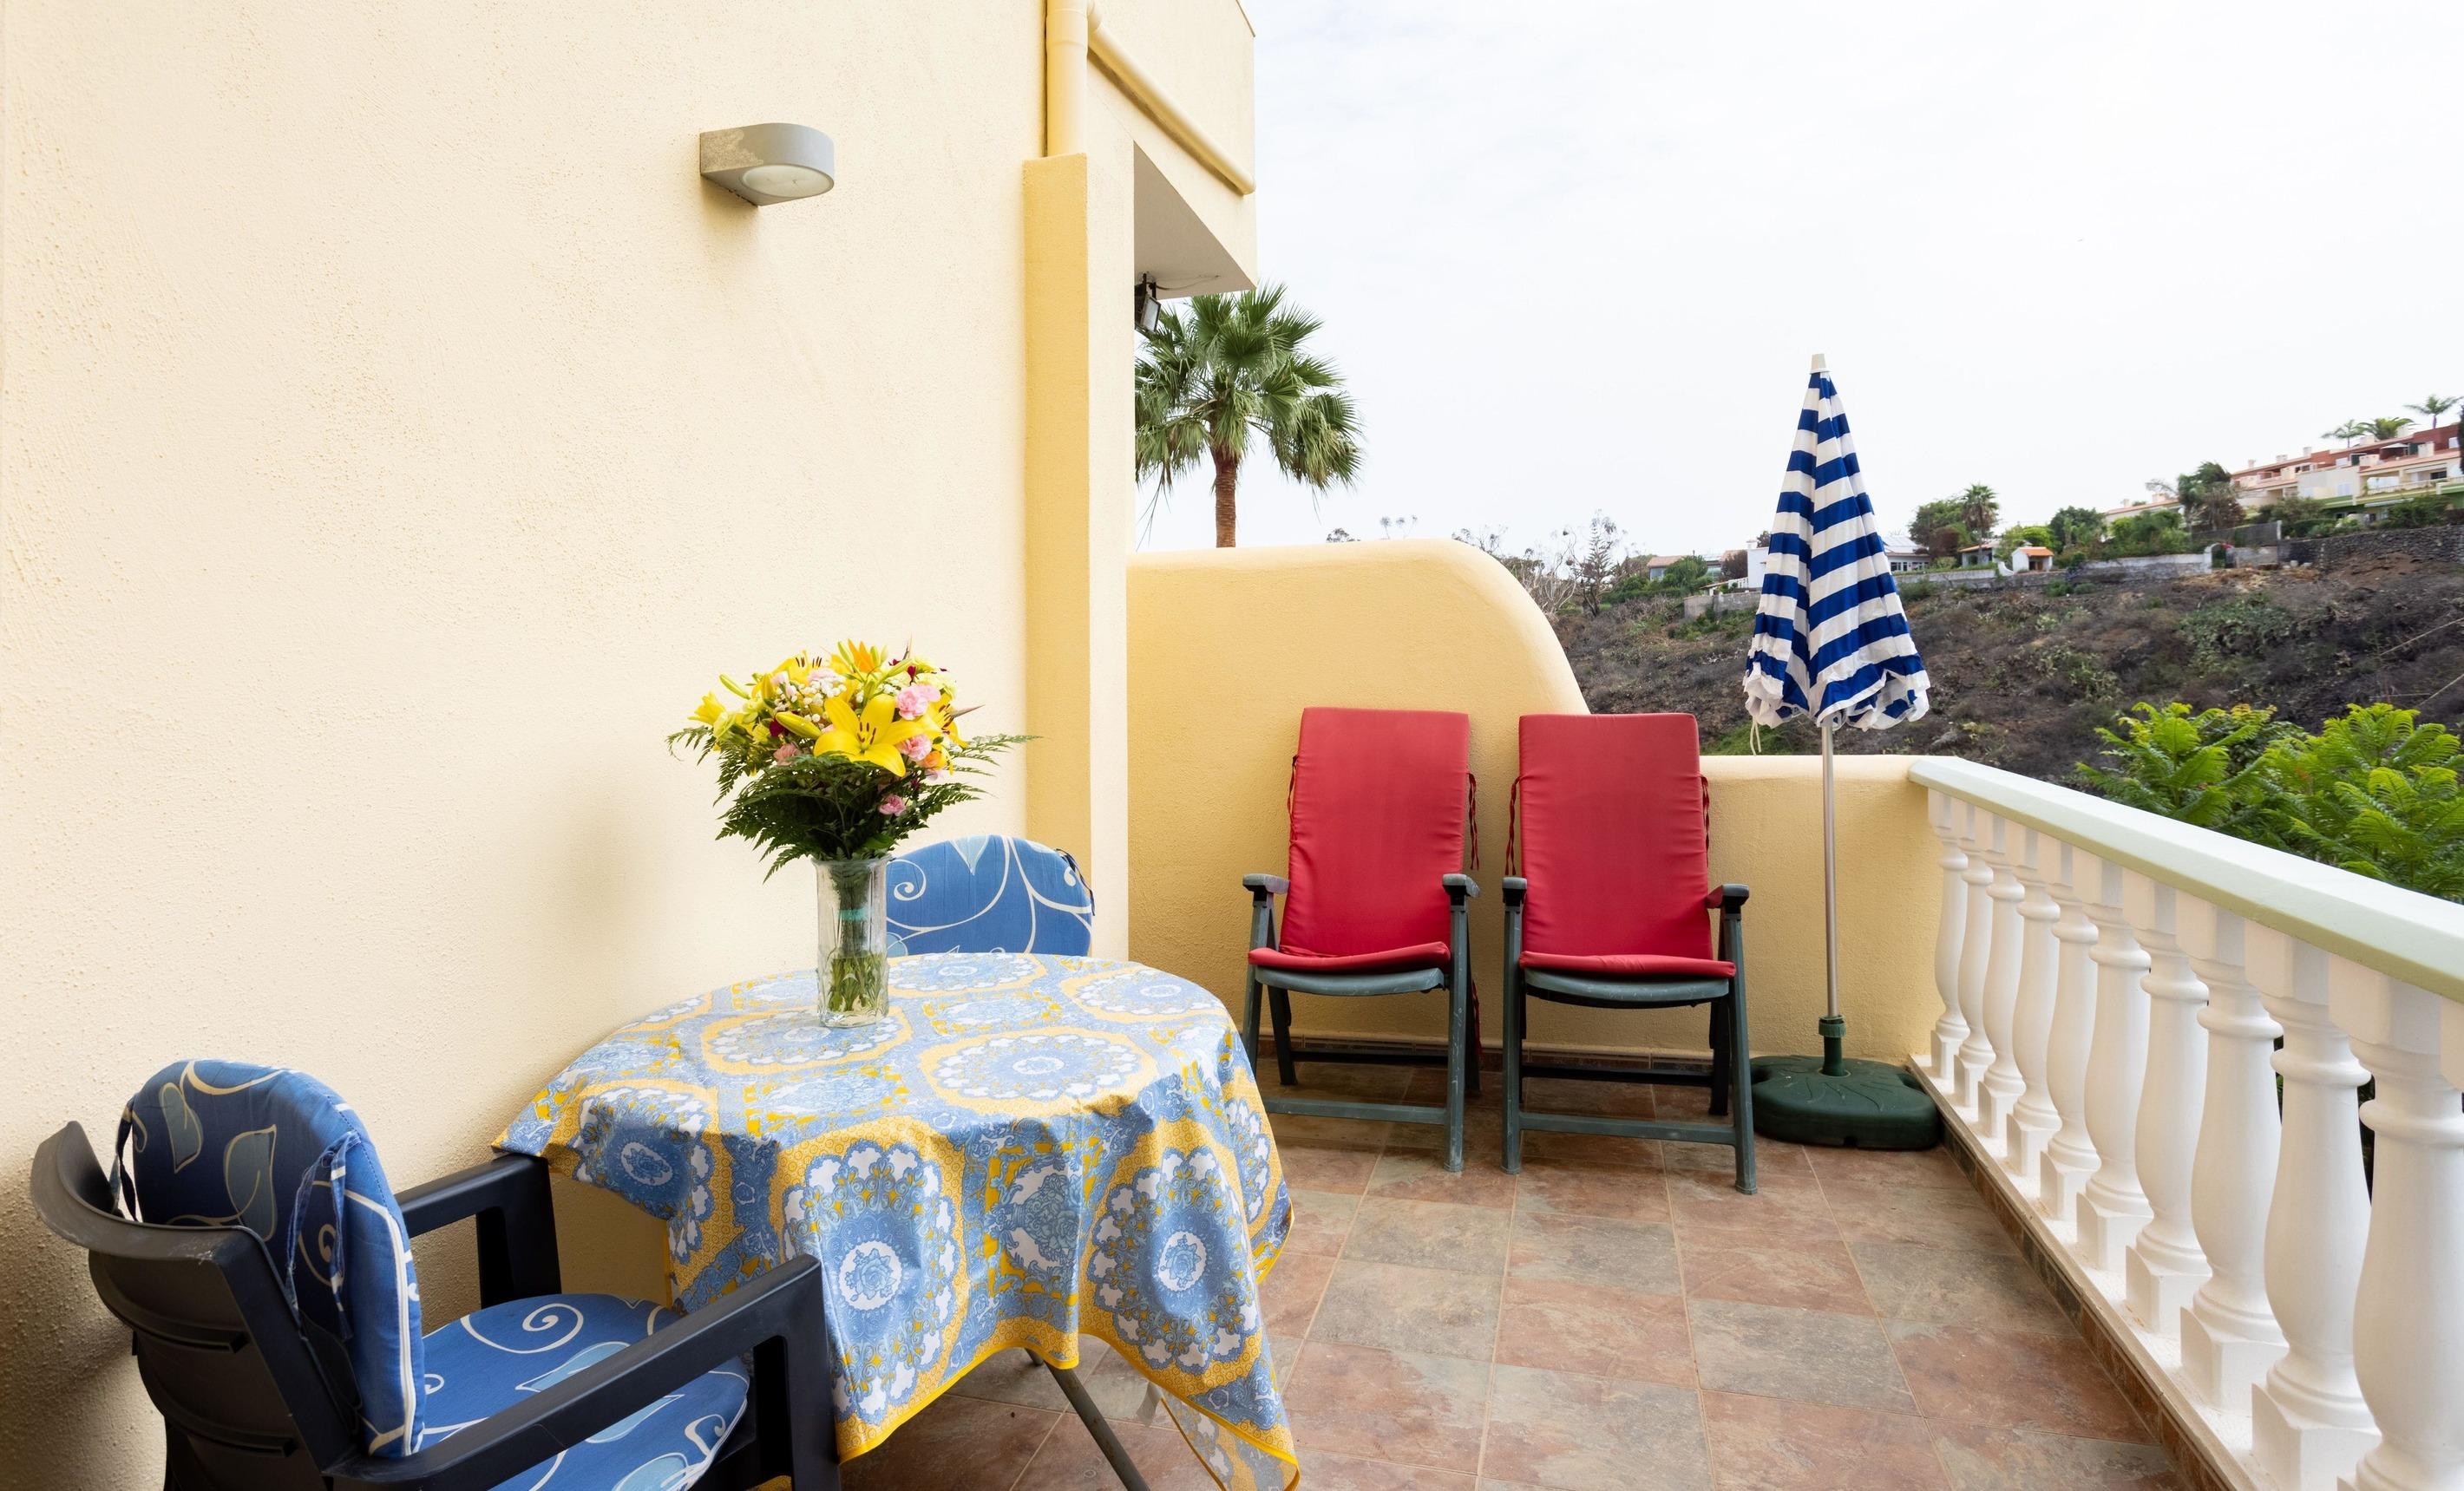 Appartement de vacances Fewo Strelitzia, im Grünen, am kleinen See, direkt am Strelitziengarten, mit Pool, Grill,  (2492987), Santa Ursula, Ténérife, Iles Canaries, Espagne, image 14